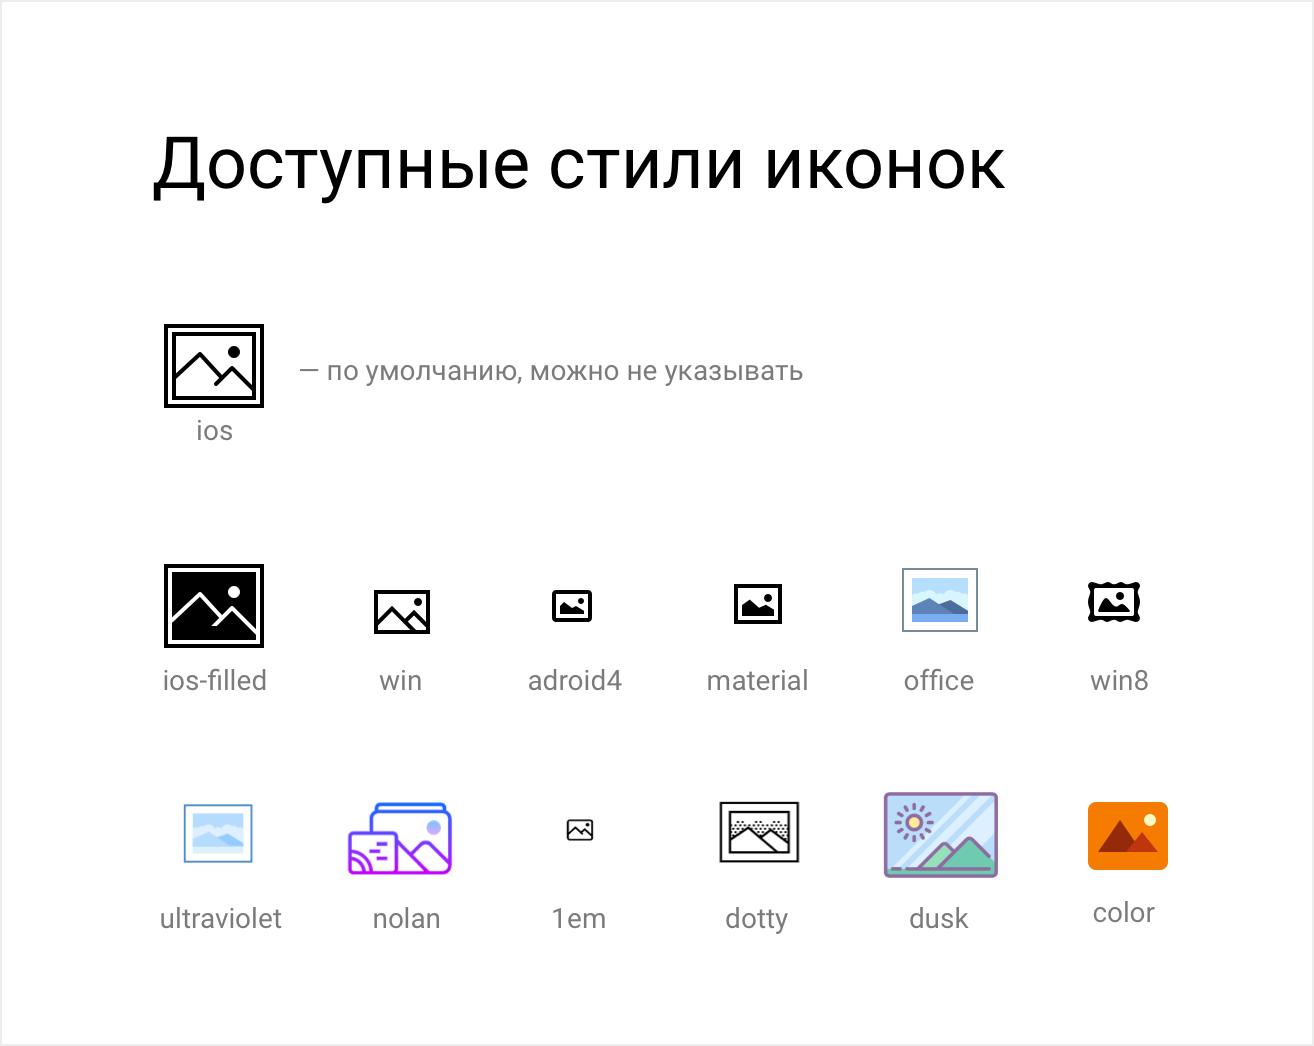 Стили иконок Icons8